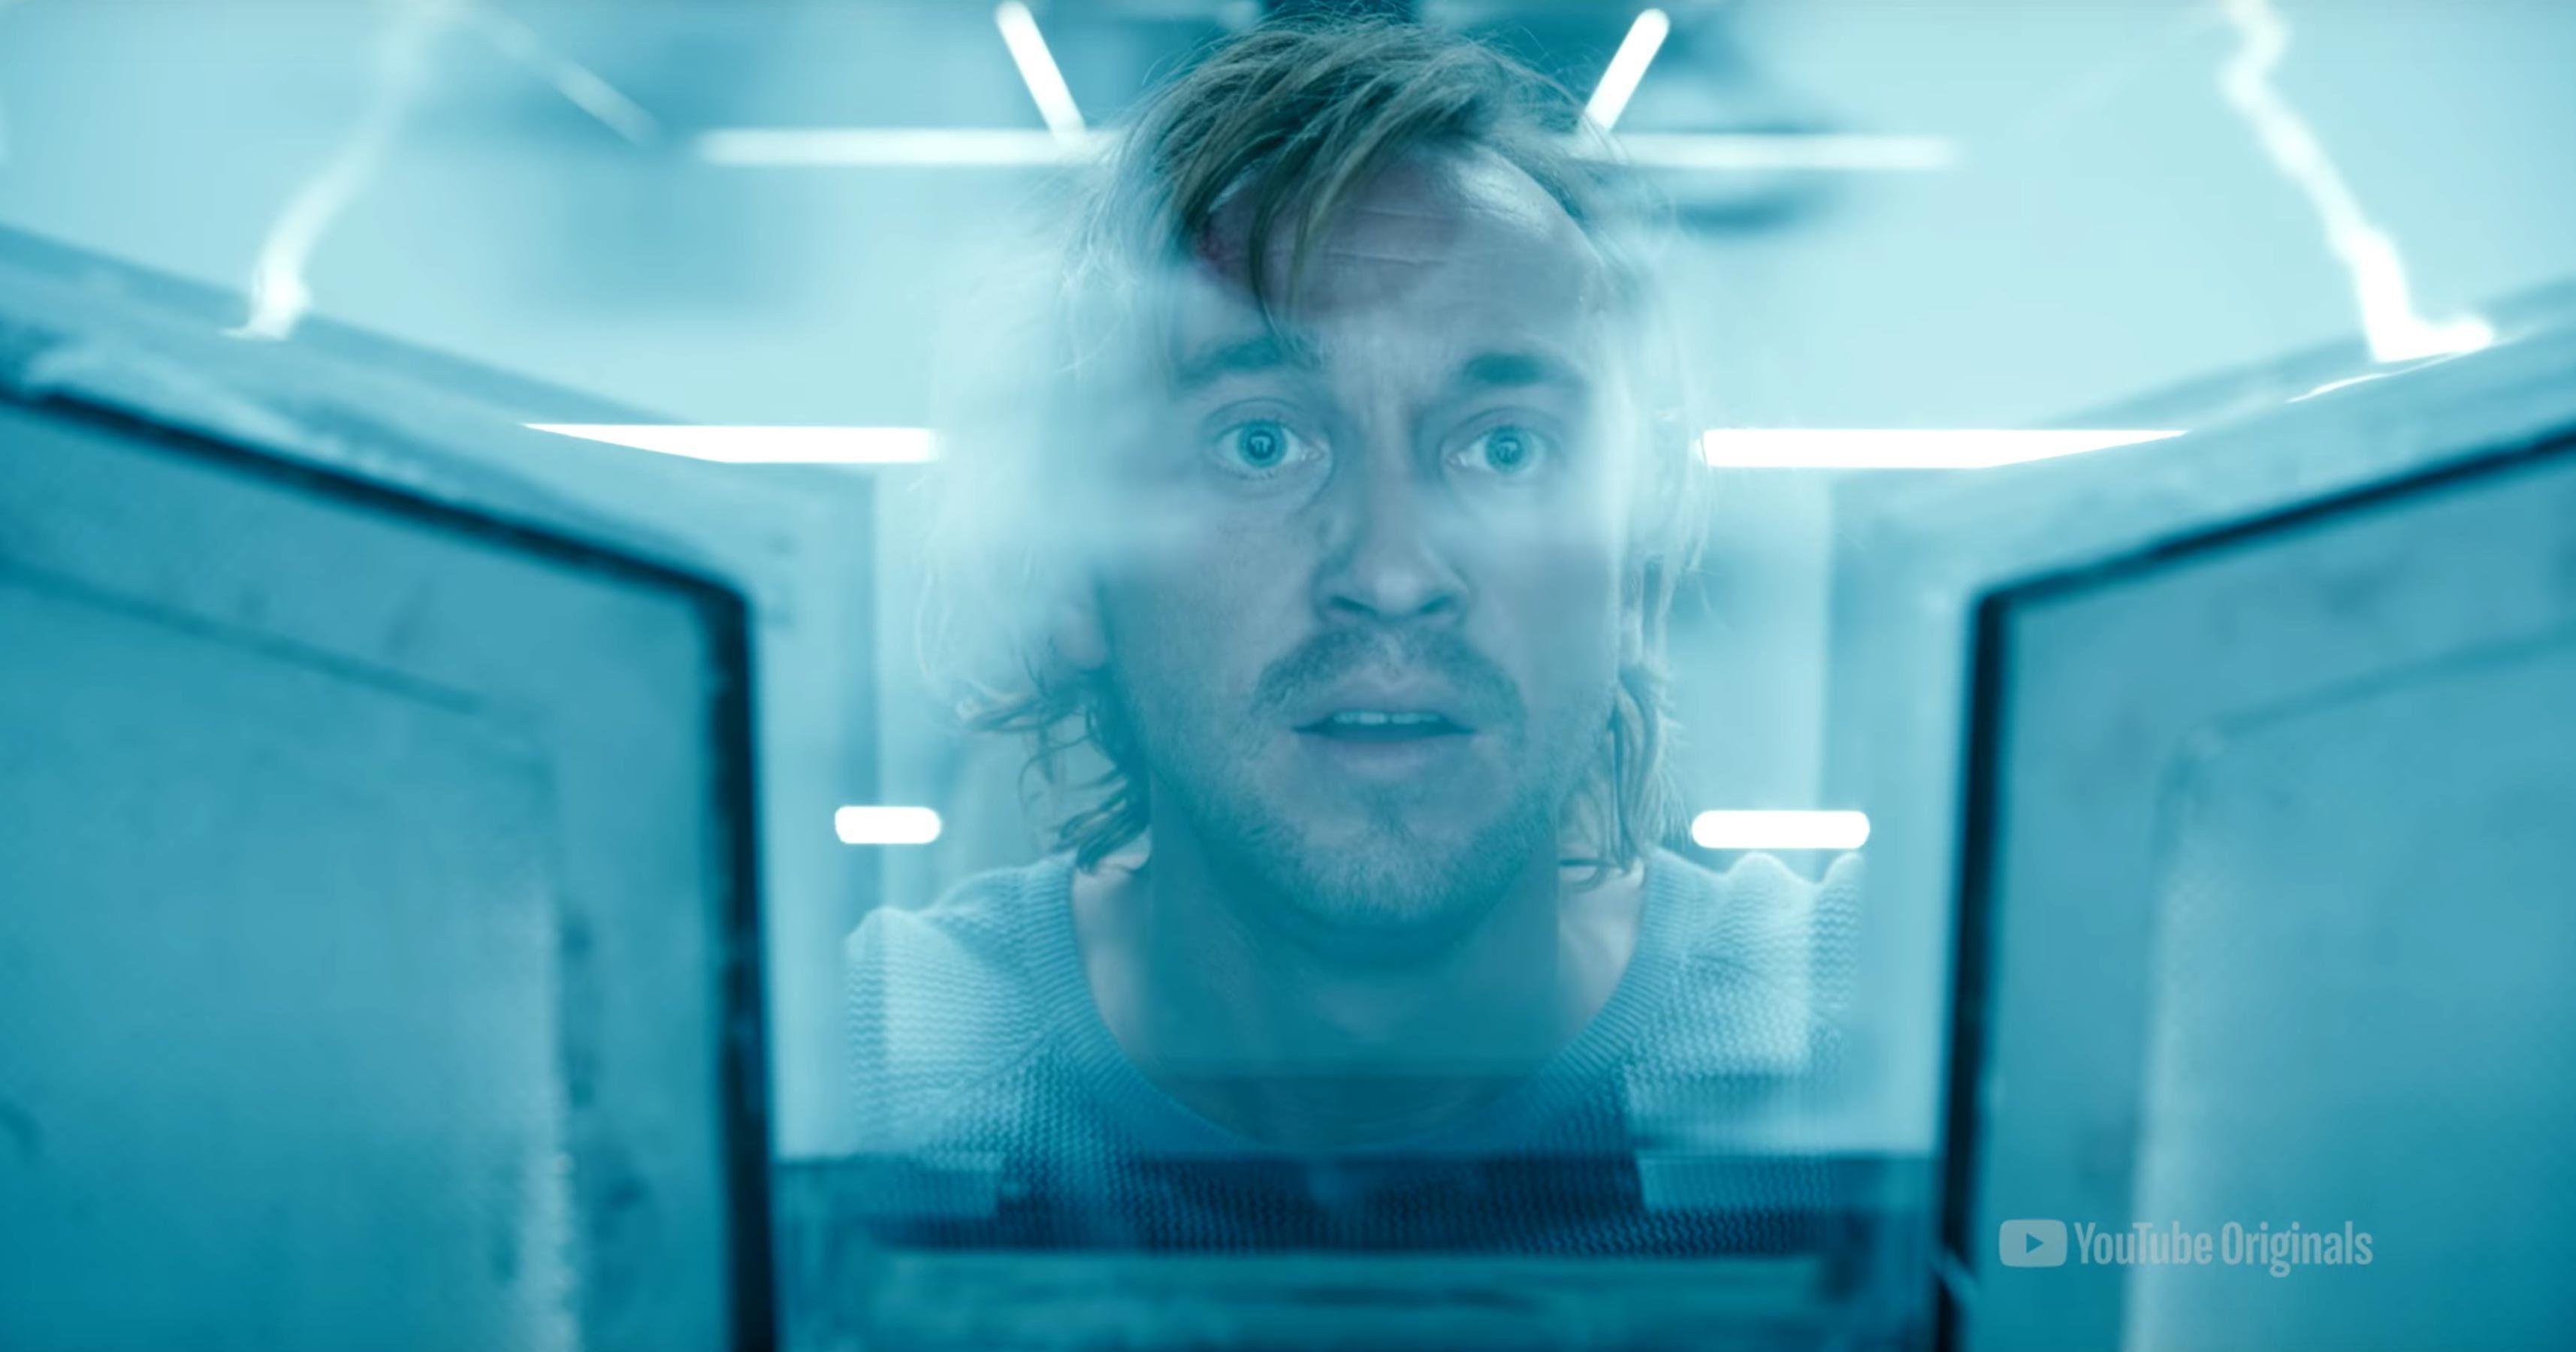 Harry Potters Tom Felton Endures Space Horrors In Youtubes Originseries Trailer Tom Felton The Originals Felton